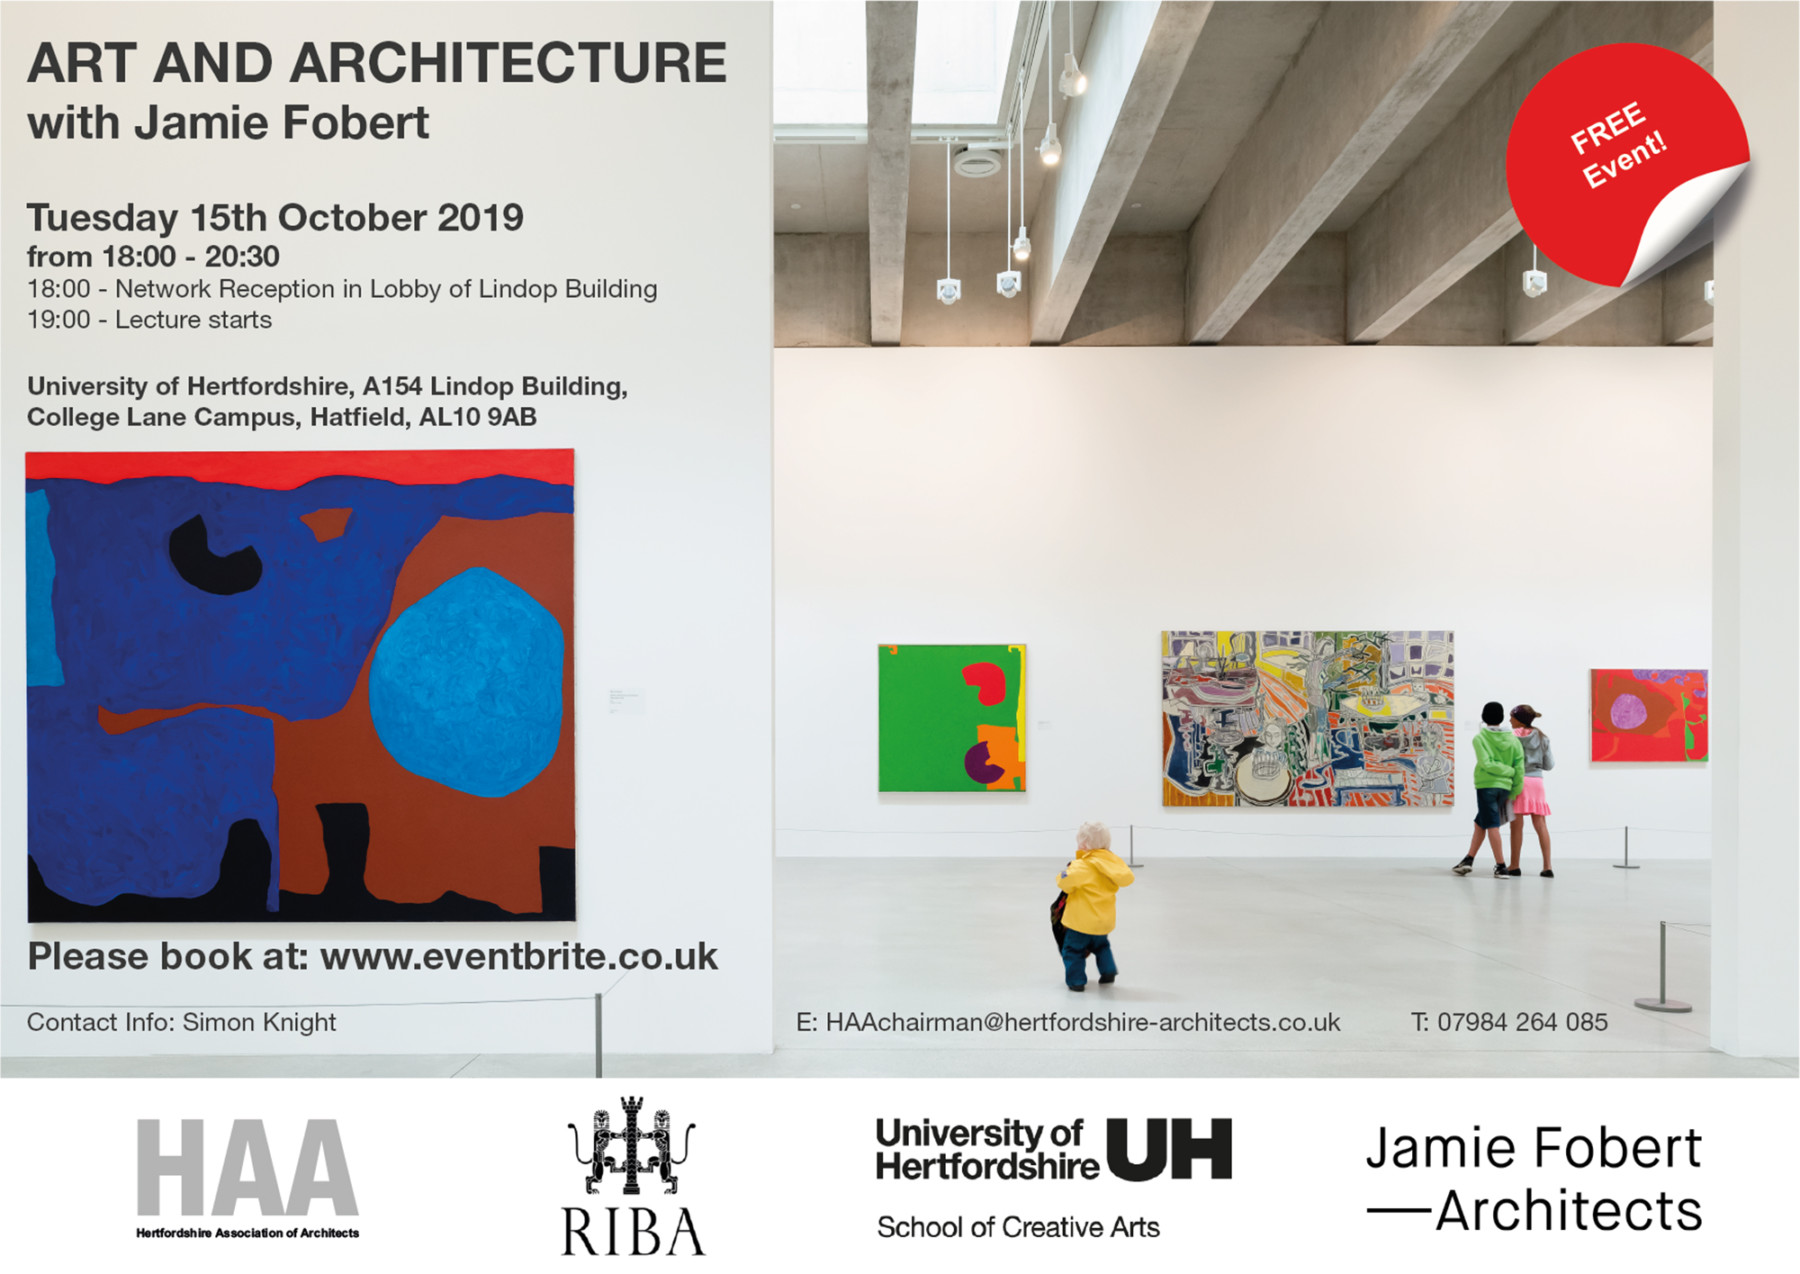 jamie-fobert-architects-lecture-university-hertfordshire-talk-art-architecture